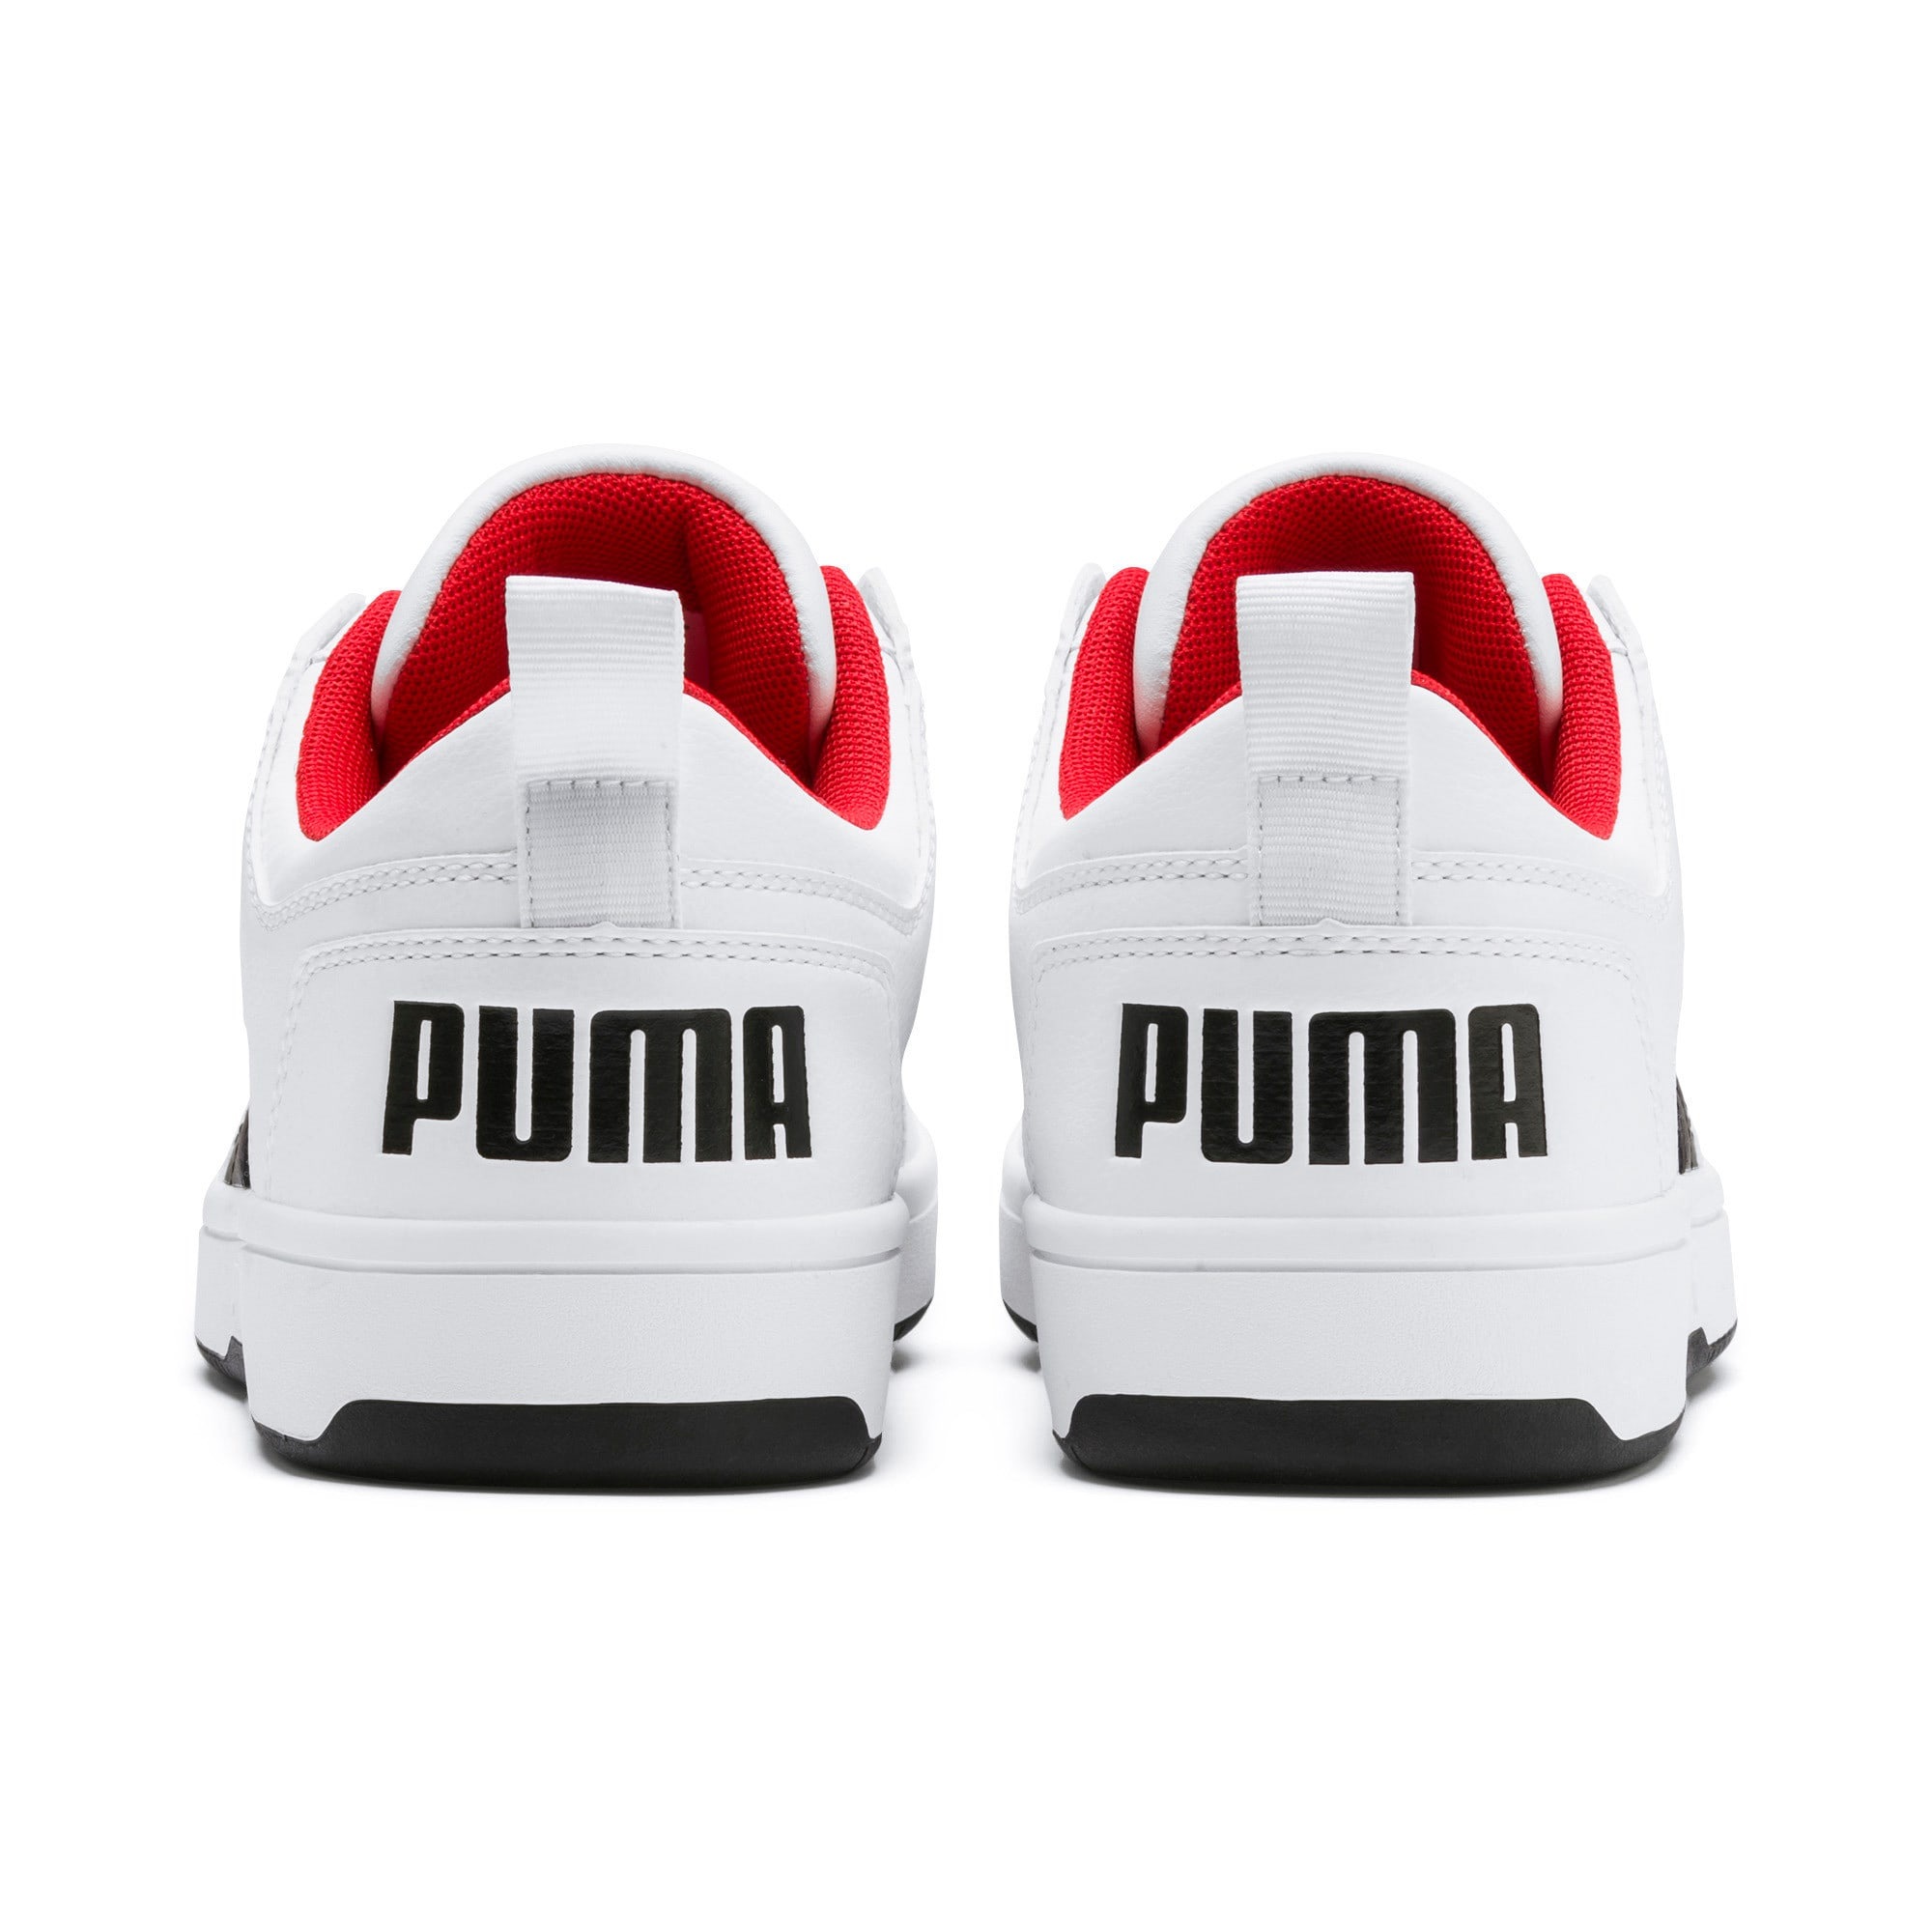 Miniatura 4 de Zapatos deportivos PUMA Rebound LayUp Lo, White-Black-High Risk Red, mediano